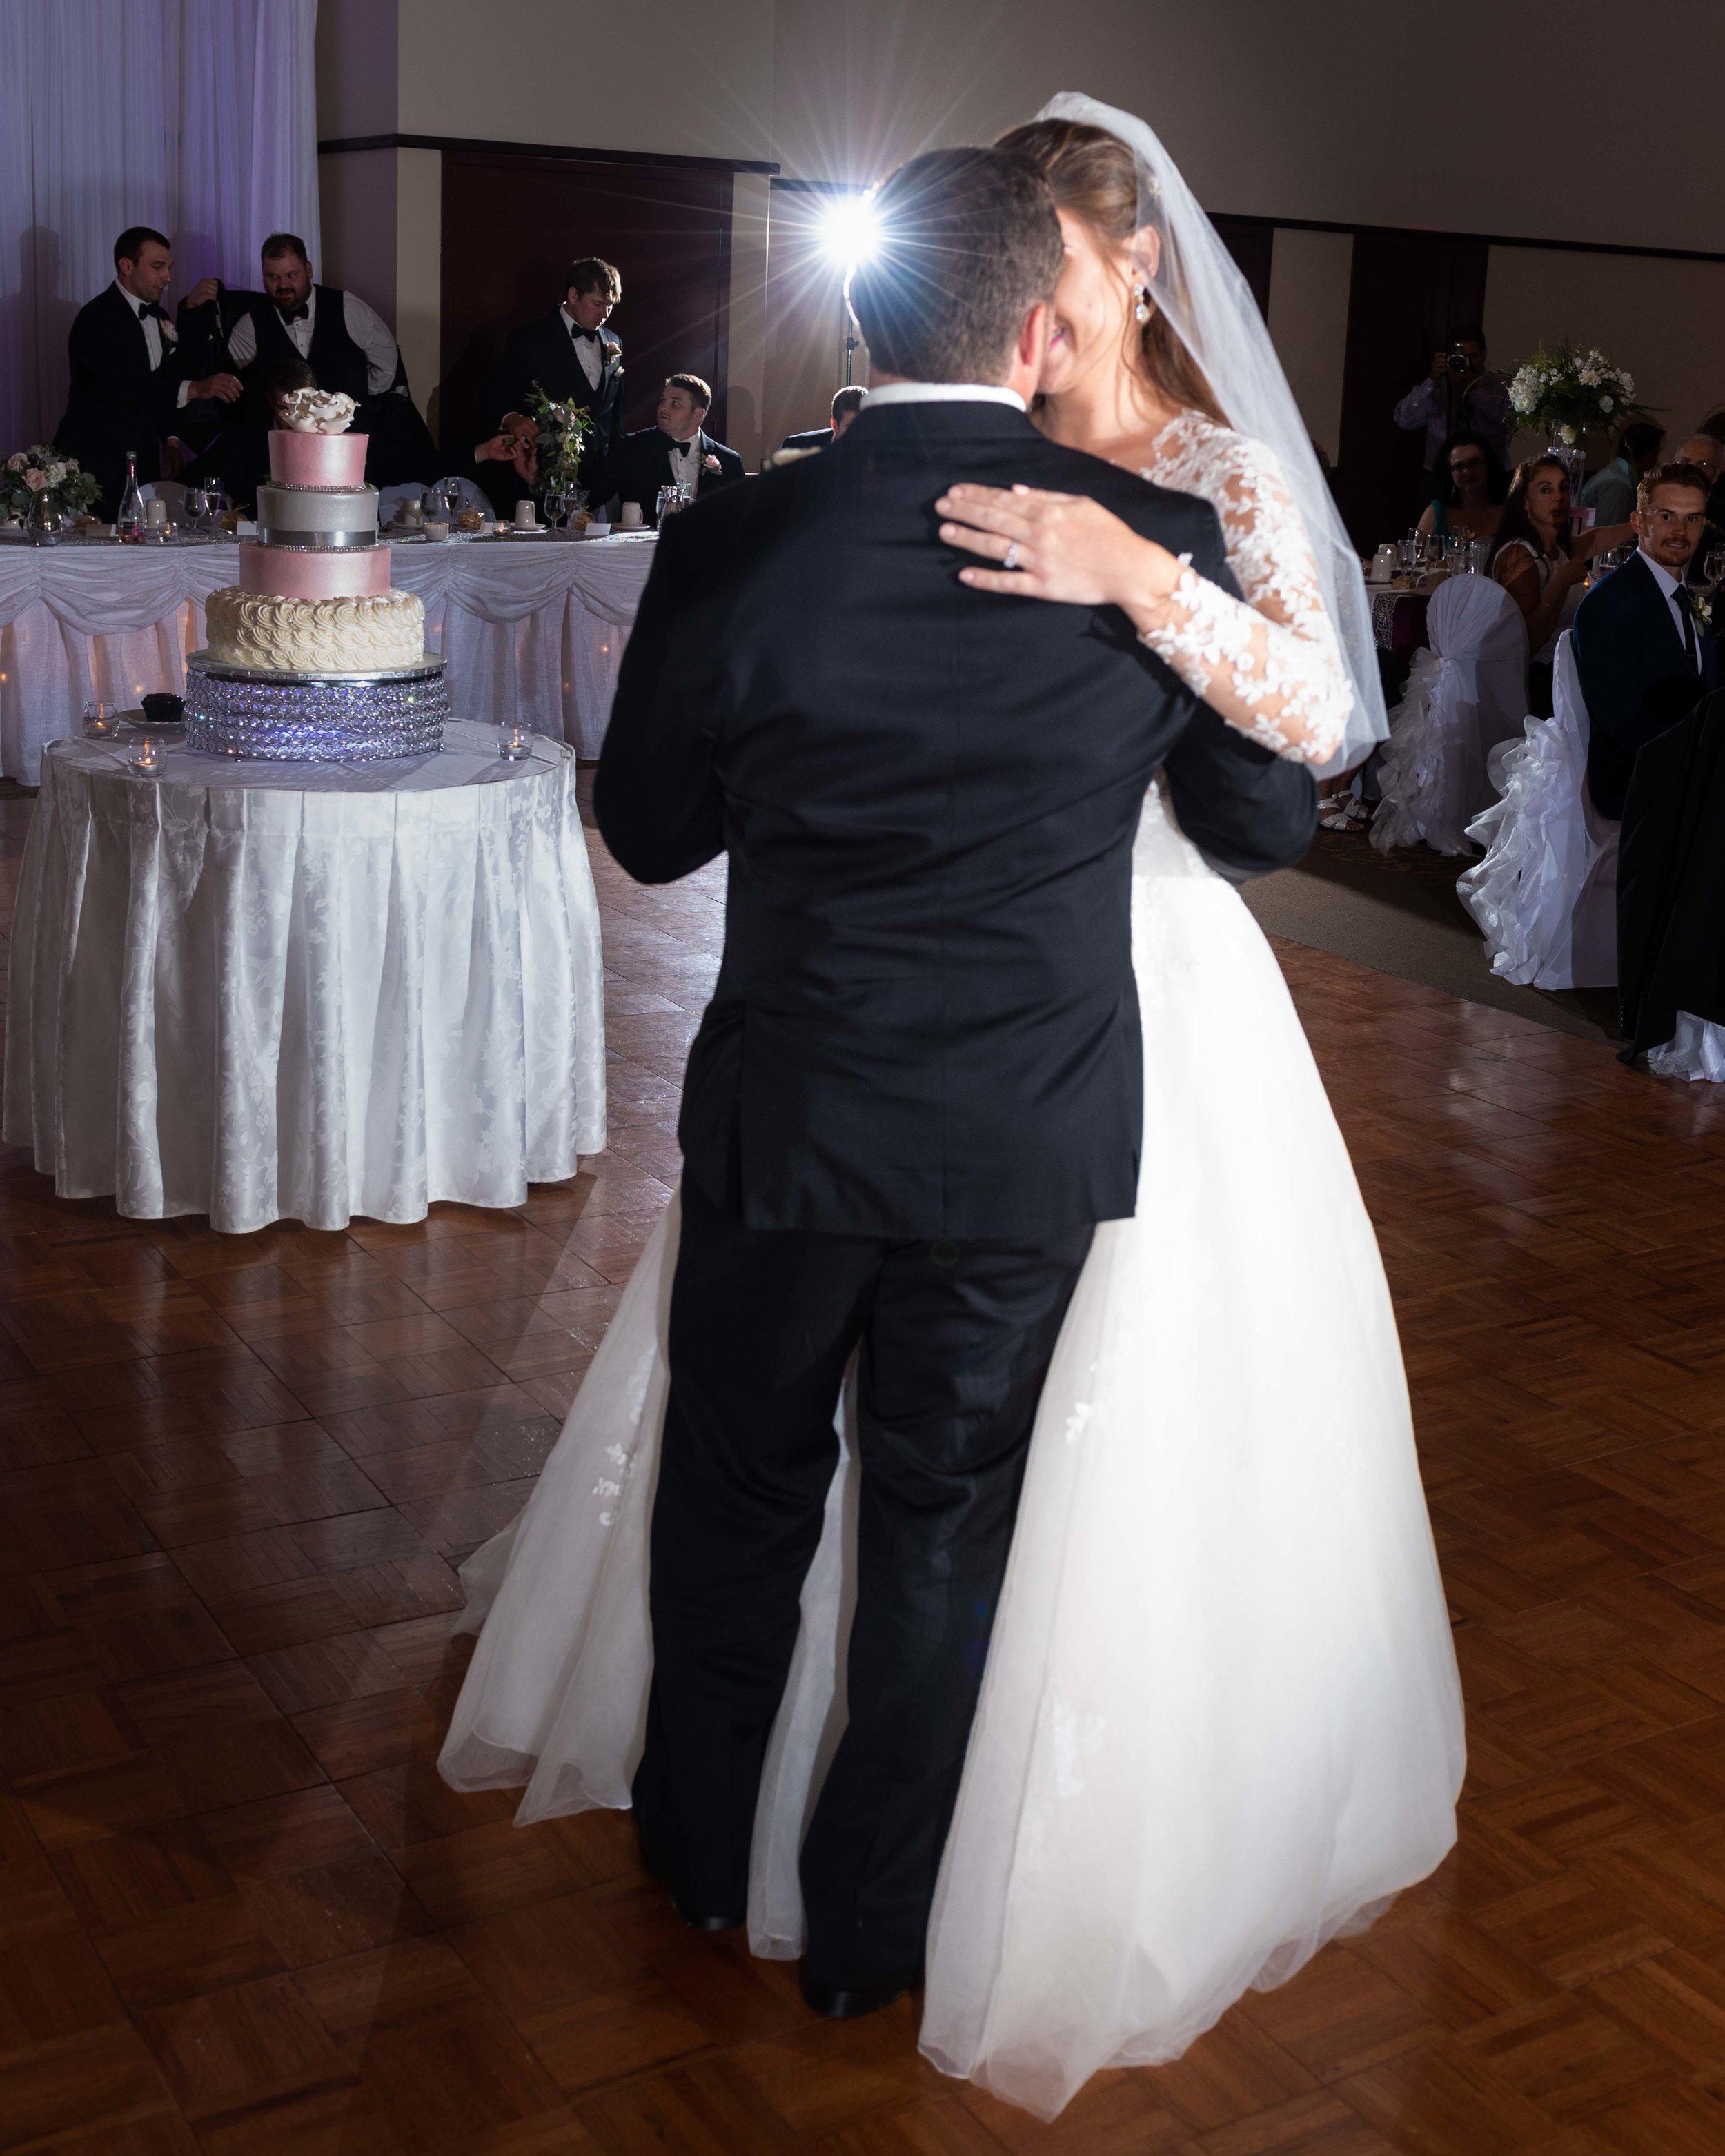 Wedding-Reception-Holy-Trinity-Center-5.jpg